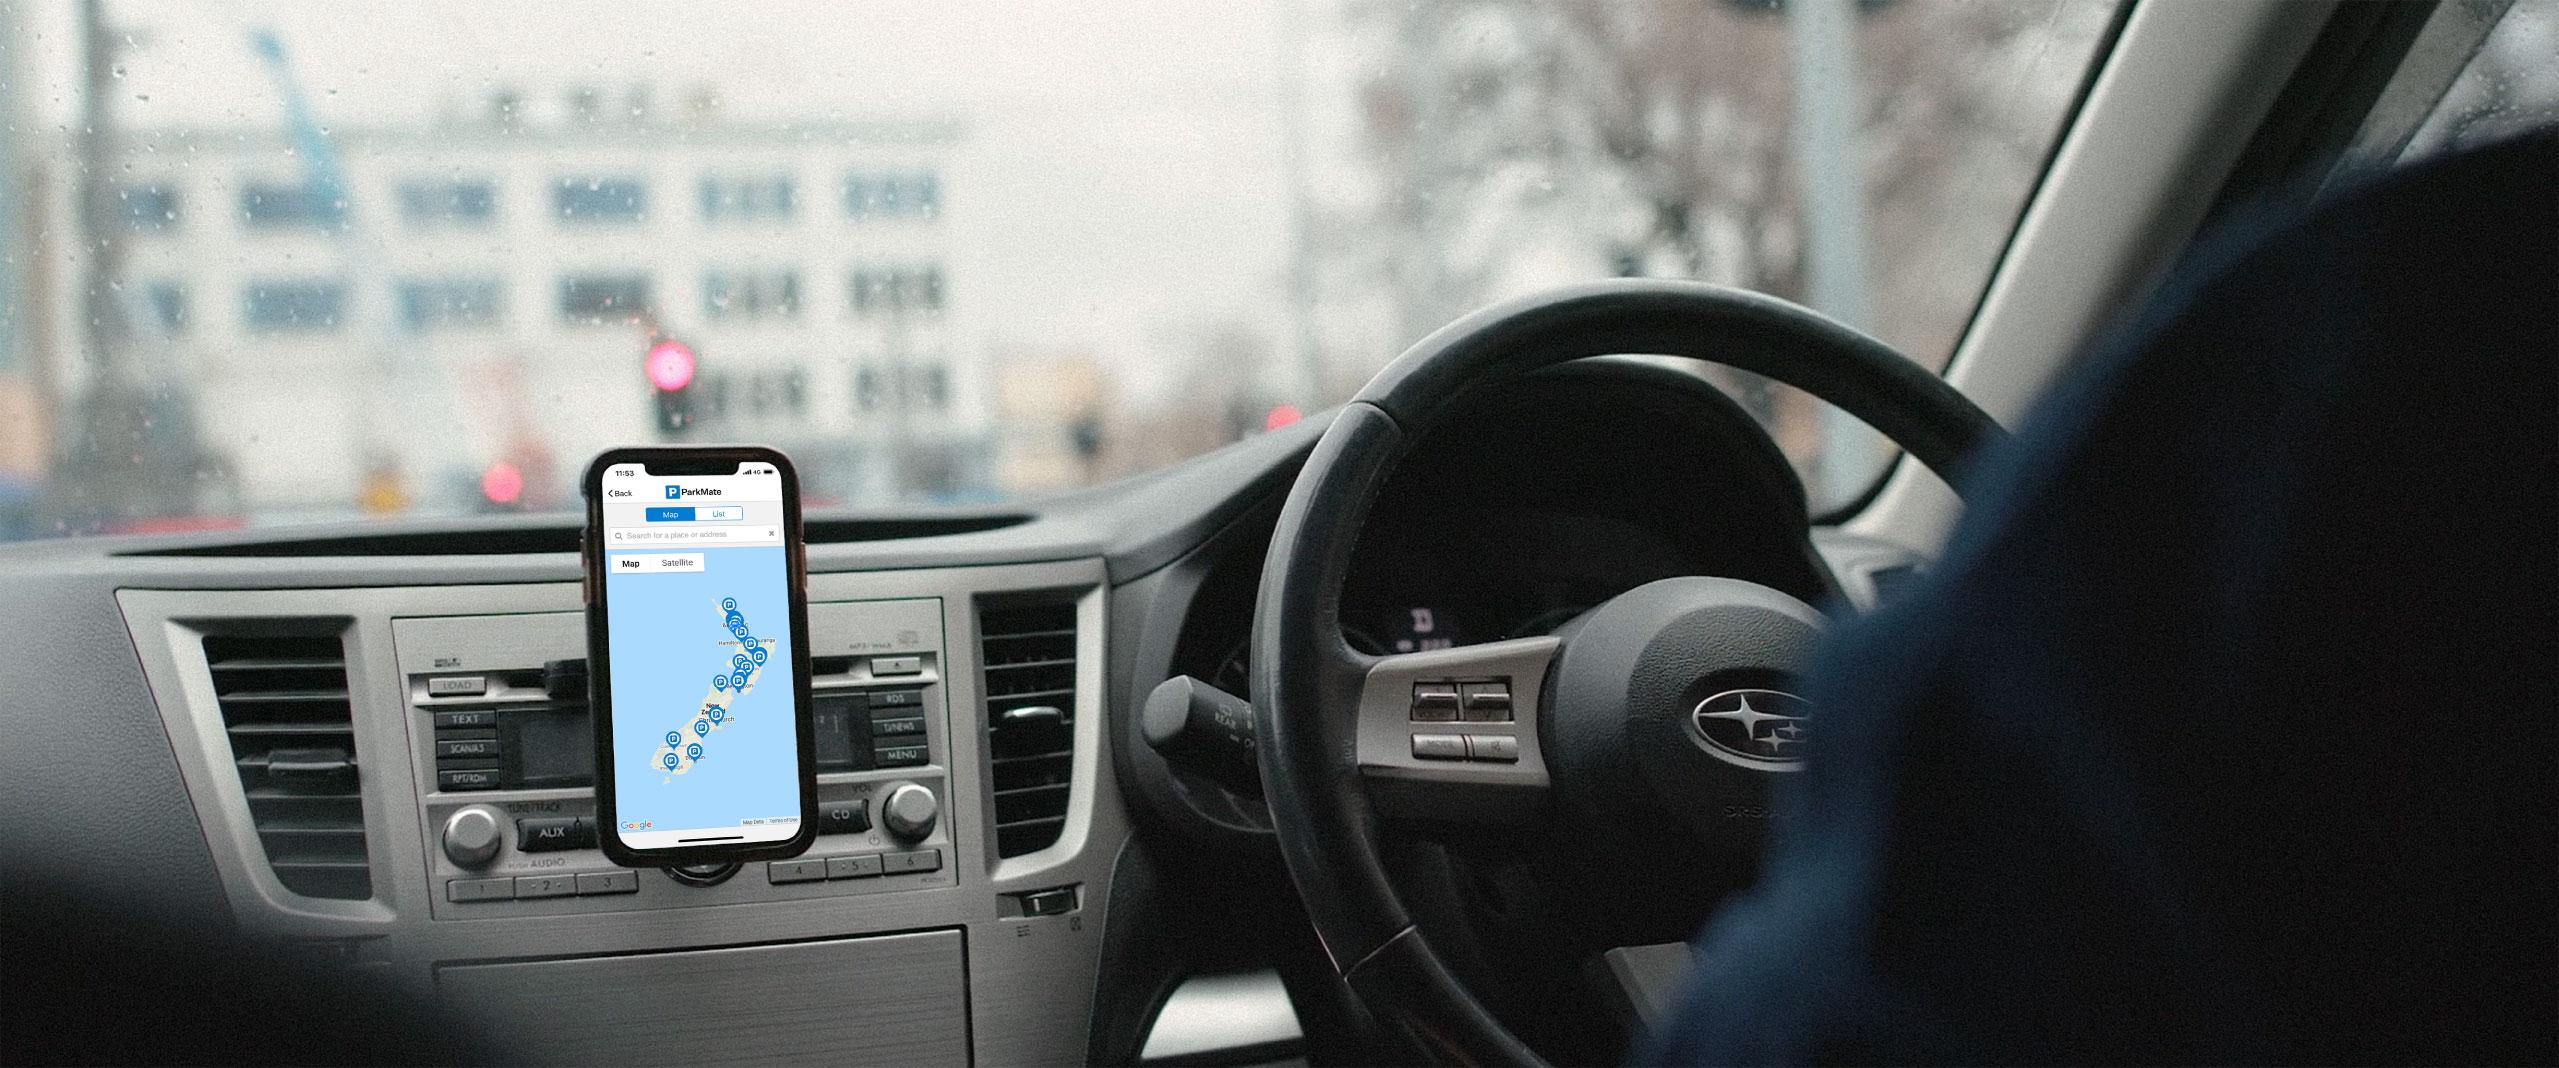 ParkMate in Car